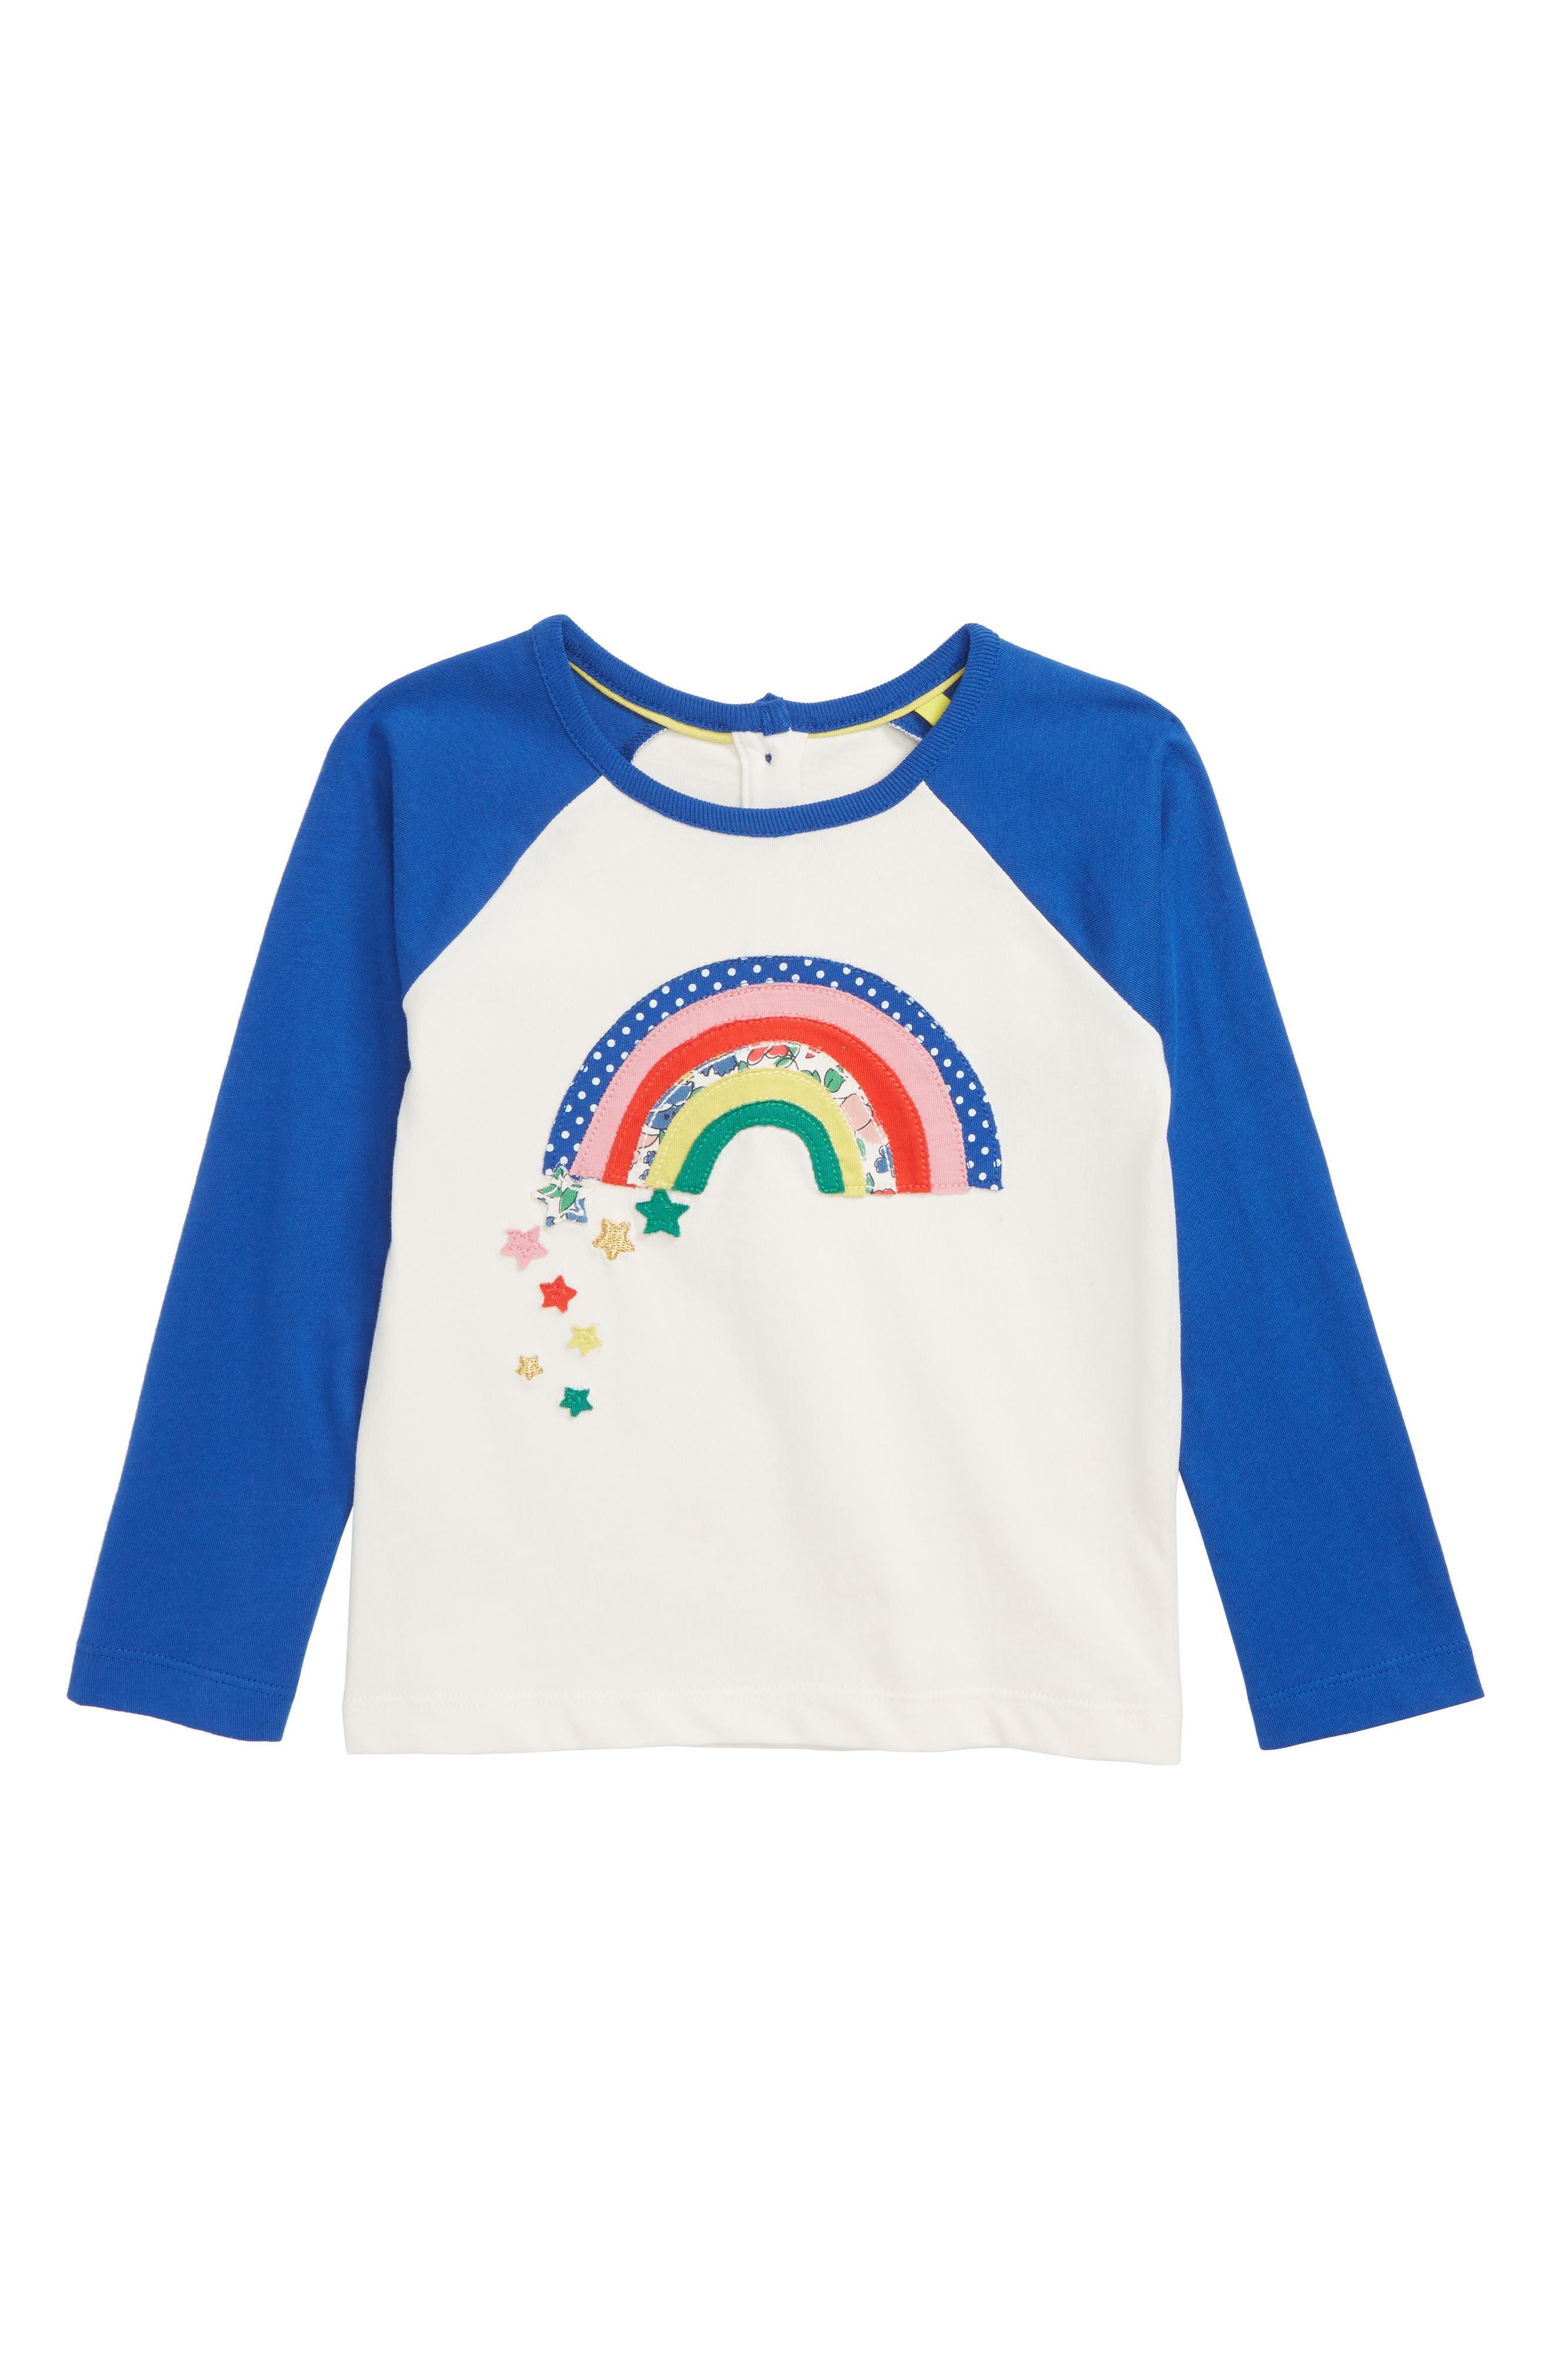 MINI BODEN,                             Rainbow Appliqué Raglan Shirt,                             Main thumbnail 1, color,                             900